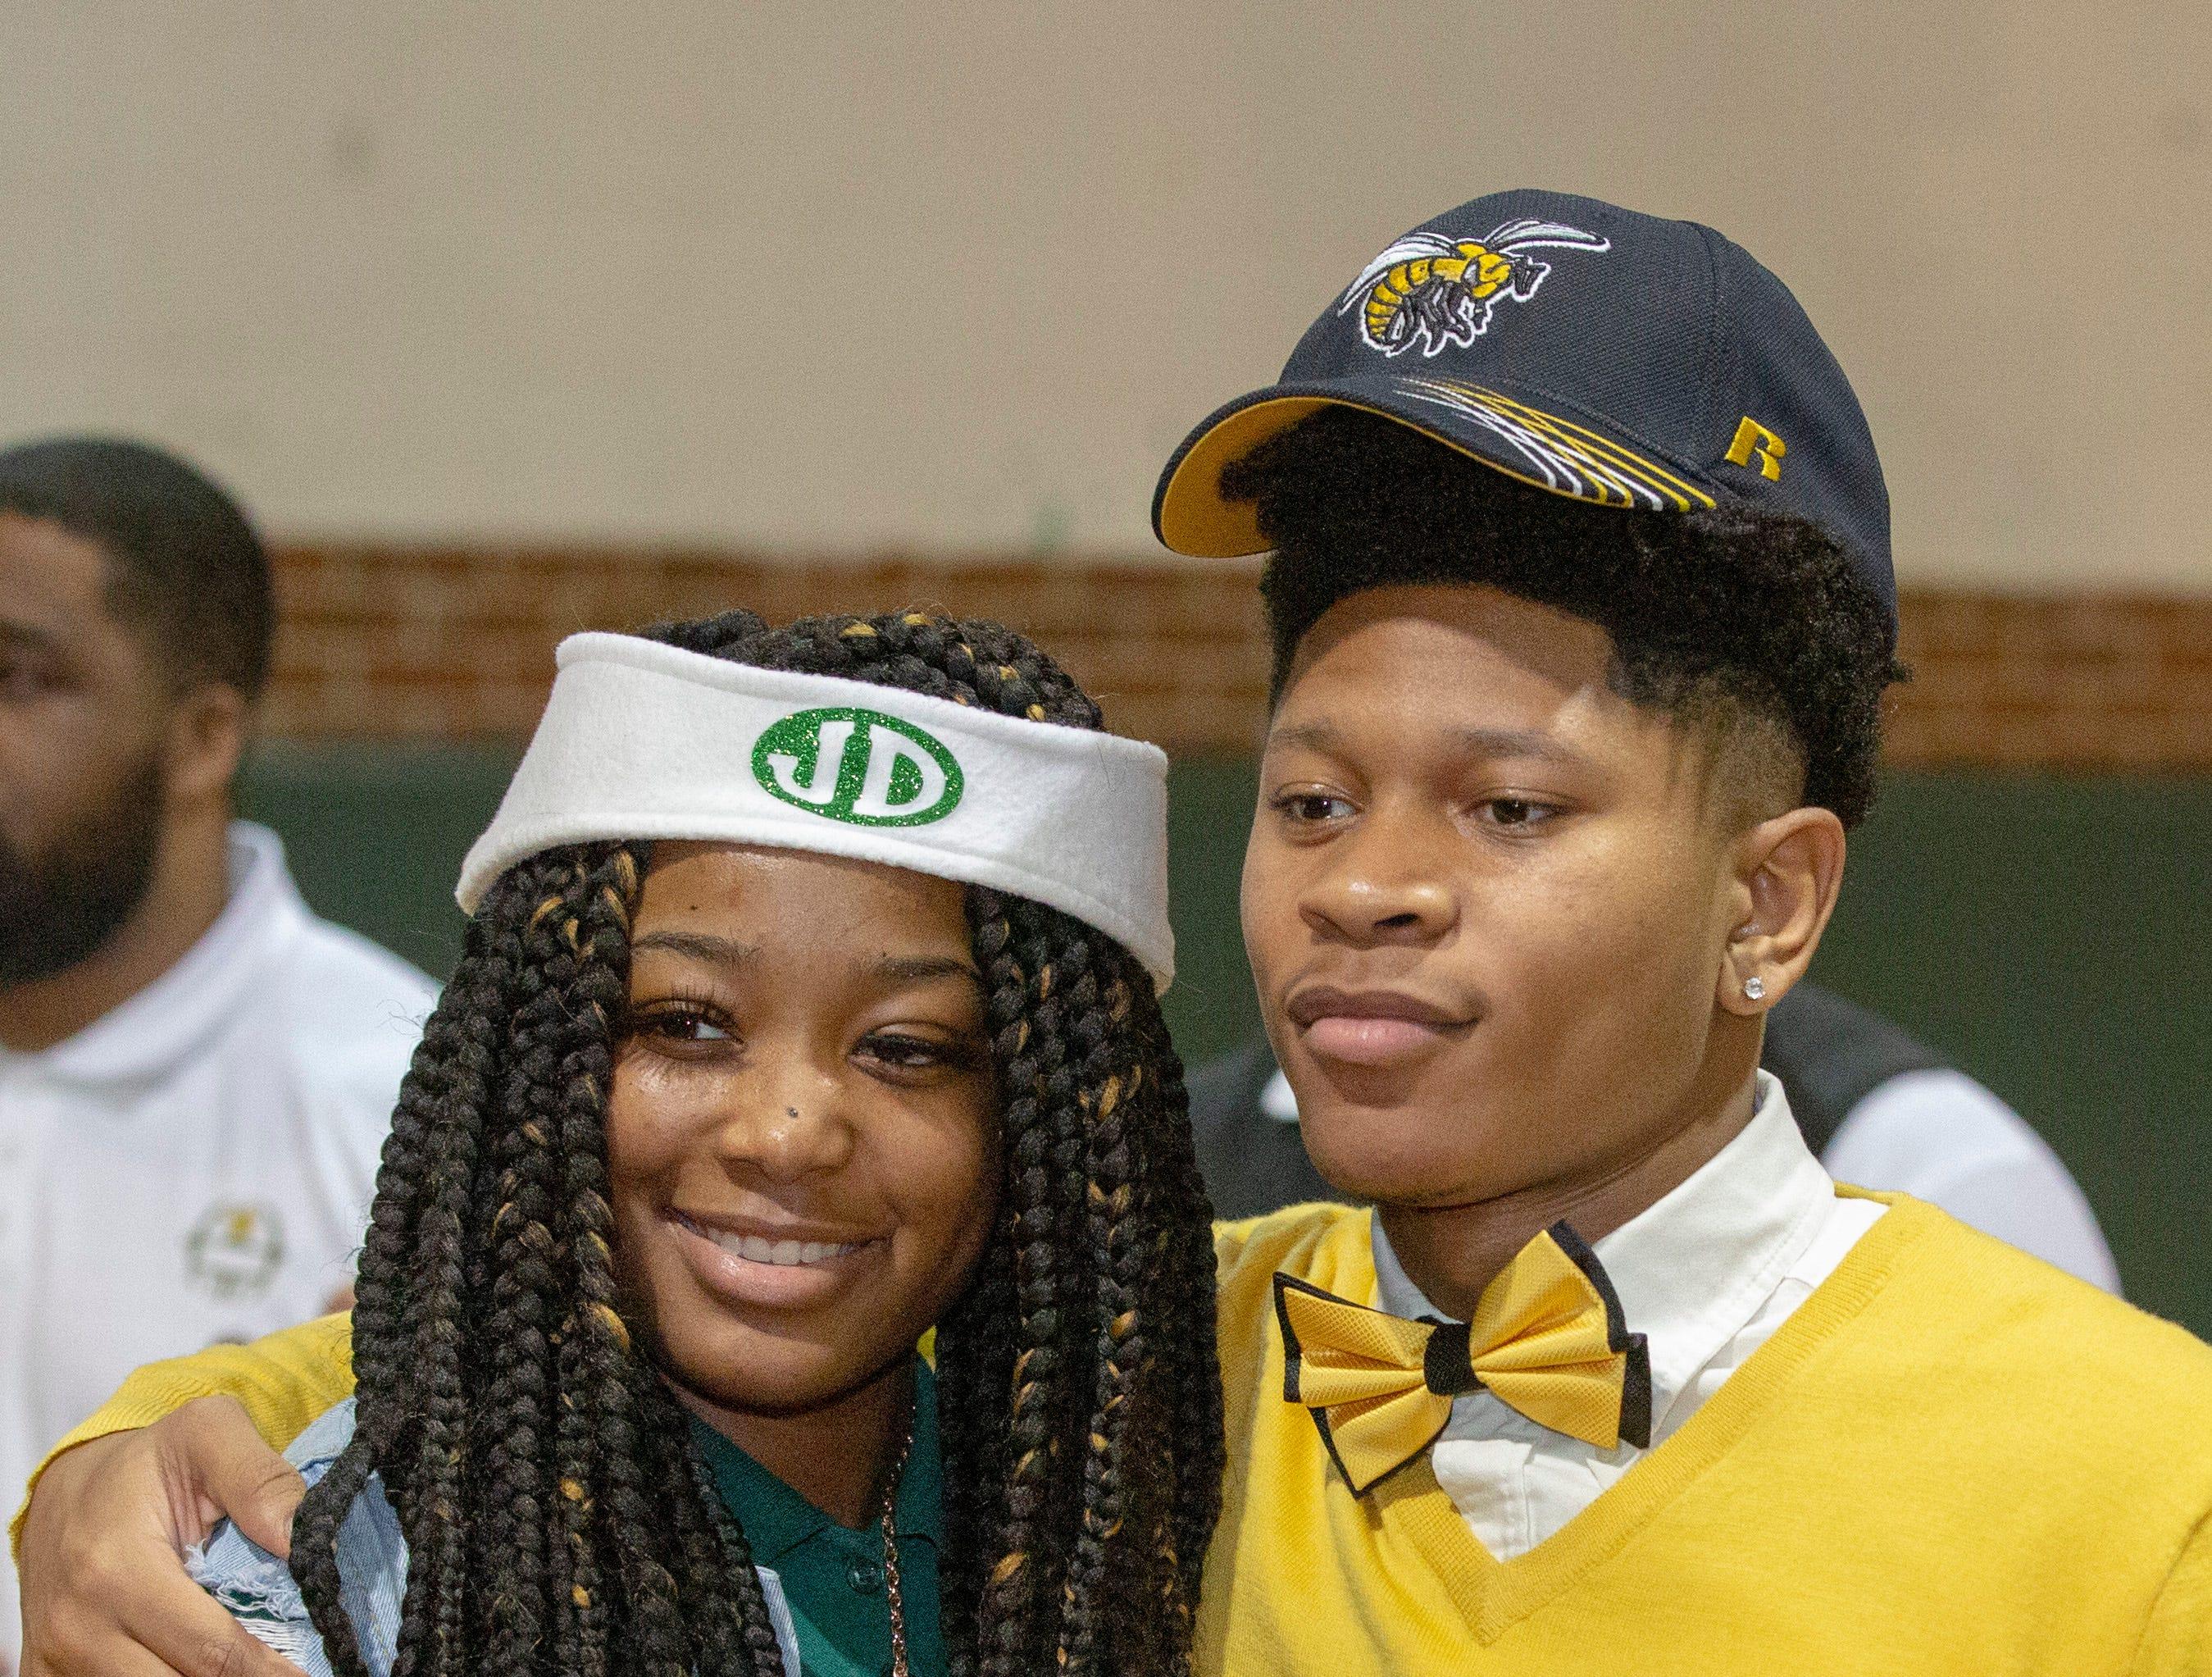 Rosales Washington, a Jeff Davis football player, will walk on at Alabama State University.